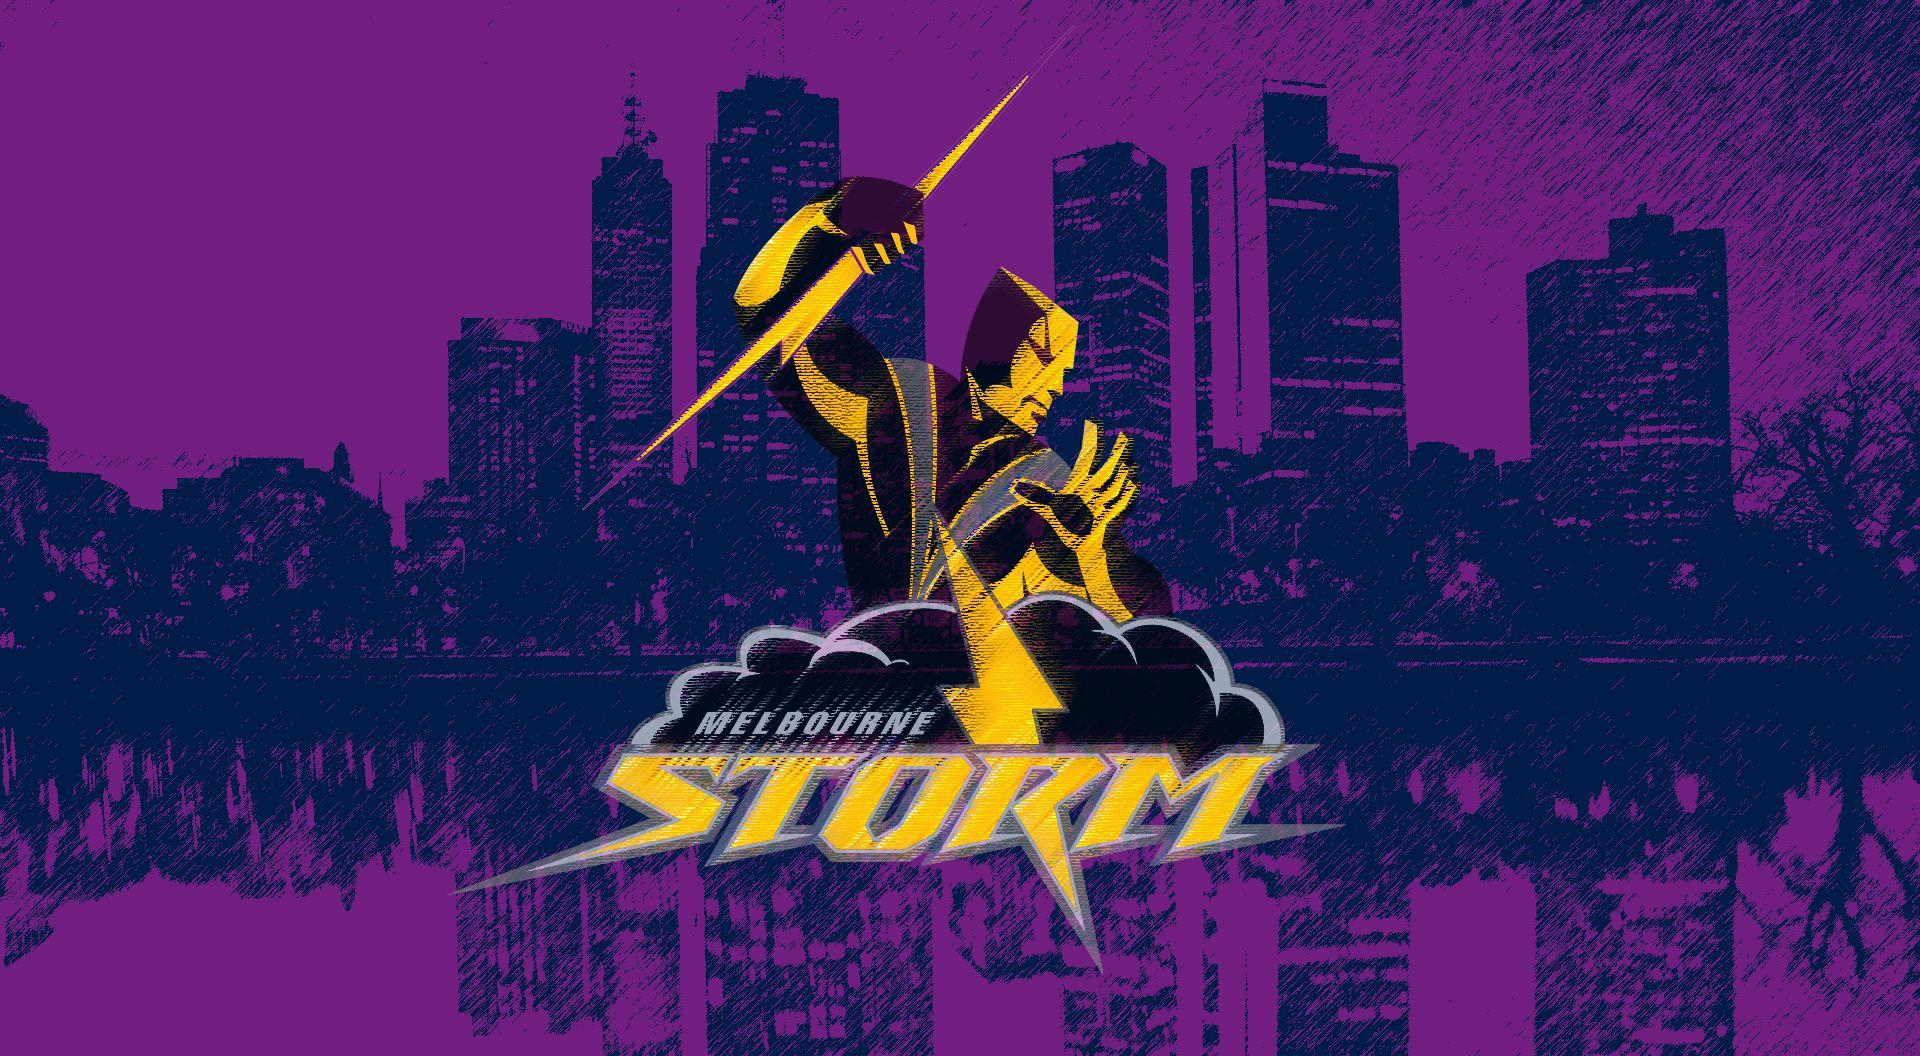 Melbourne Storm Purple City Wallpaper by Sunnyboiiii